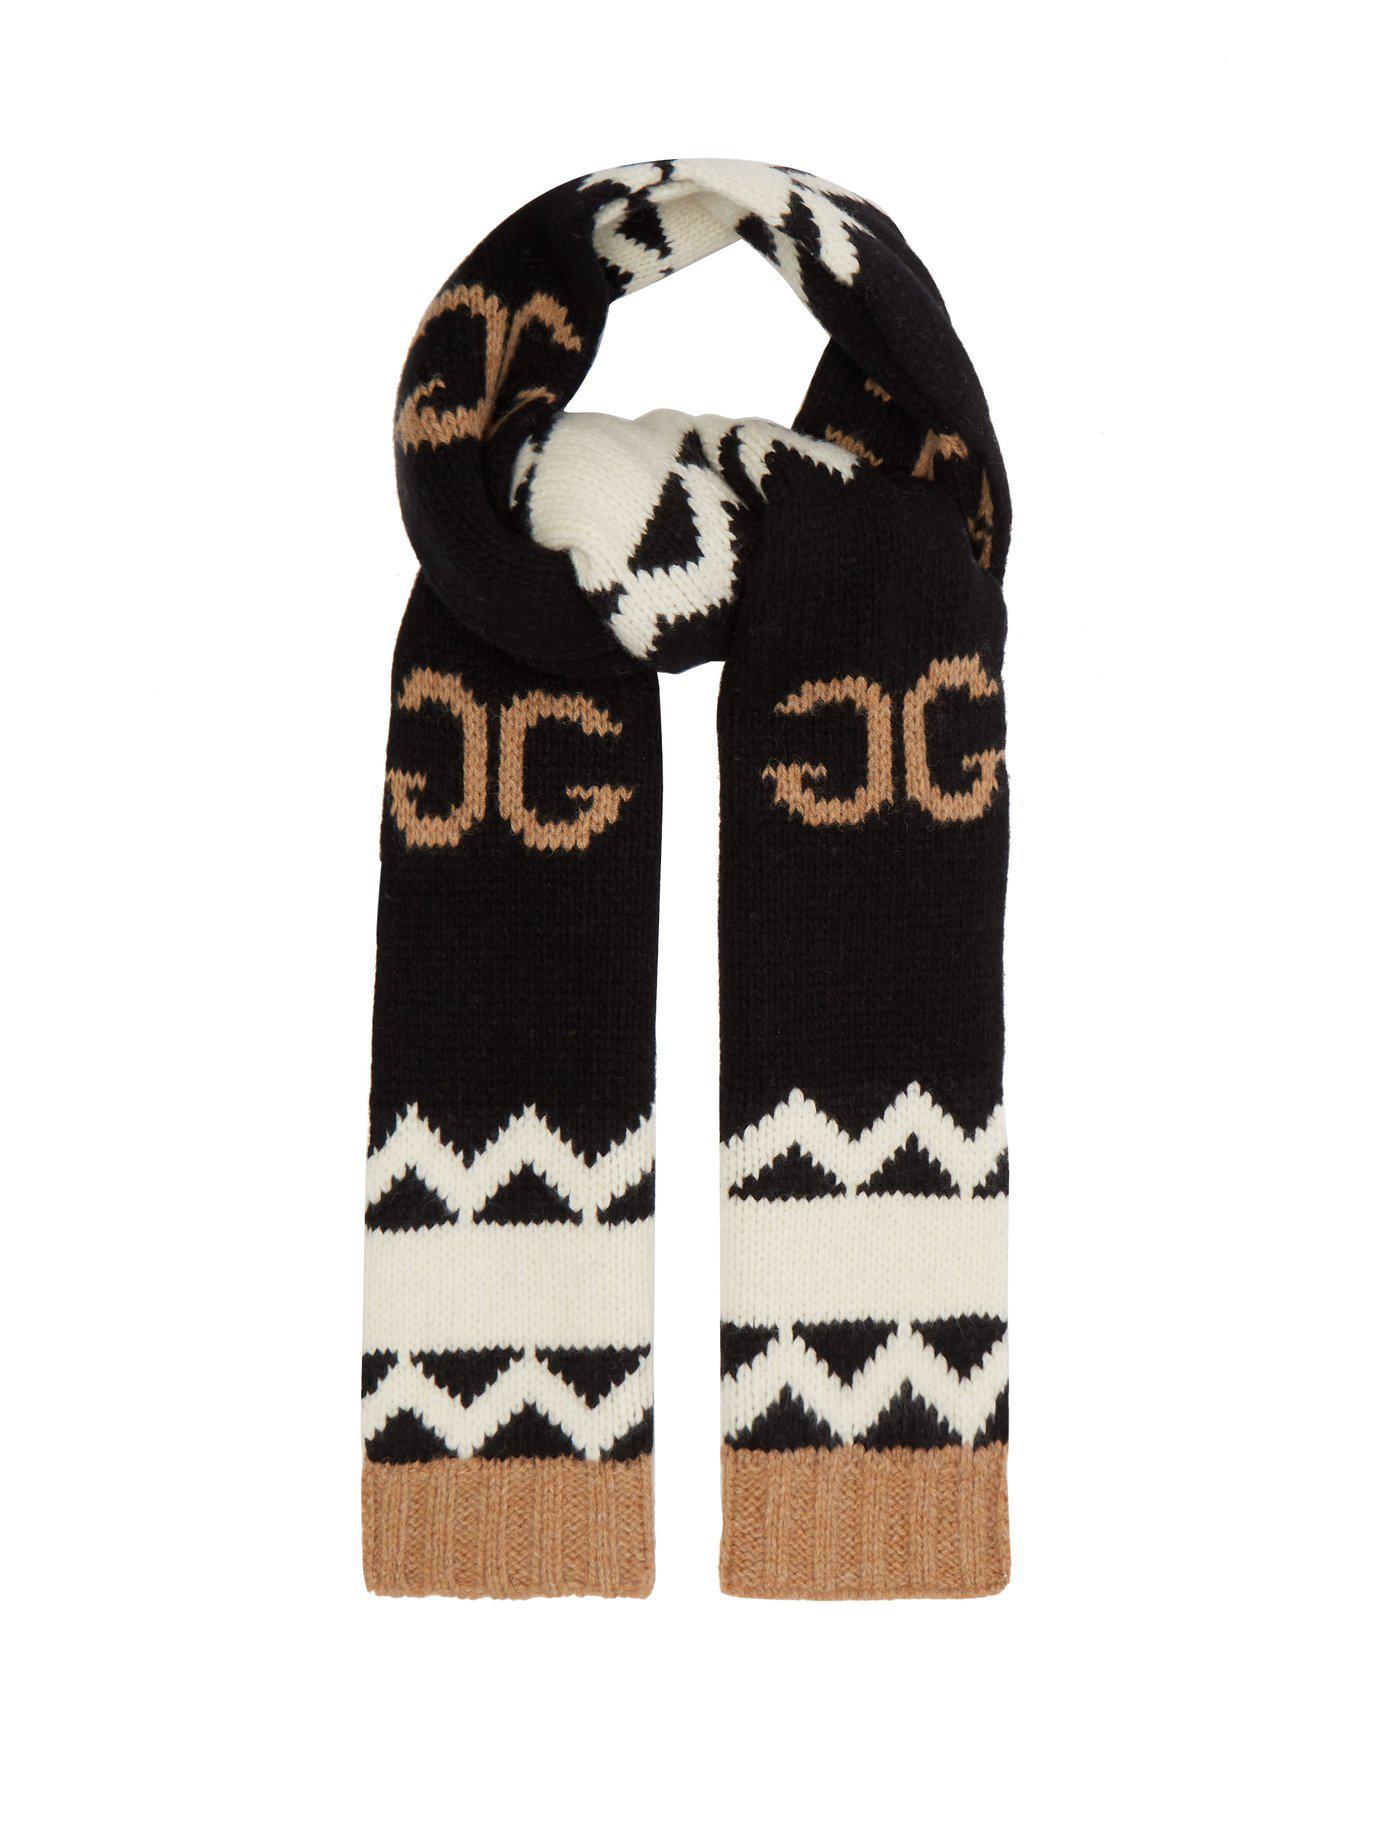 ab6b85f1ee62a Lyst - Gucci Gg Logo Intarsia Wool Scarf in Black for Men